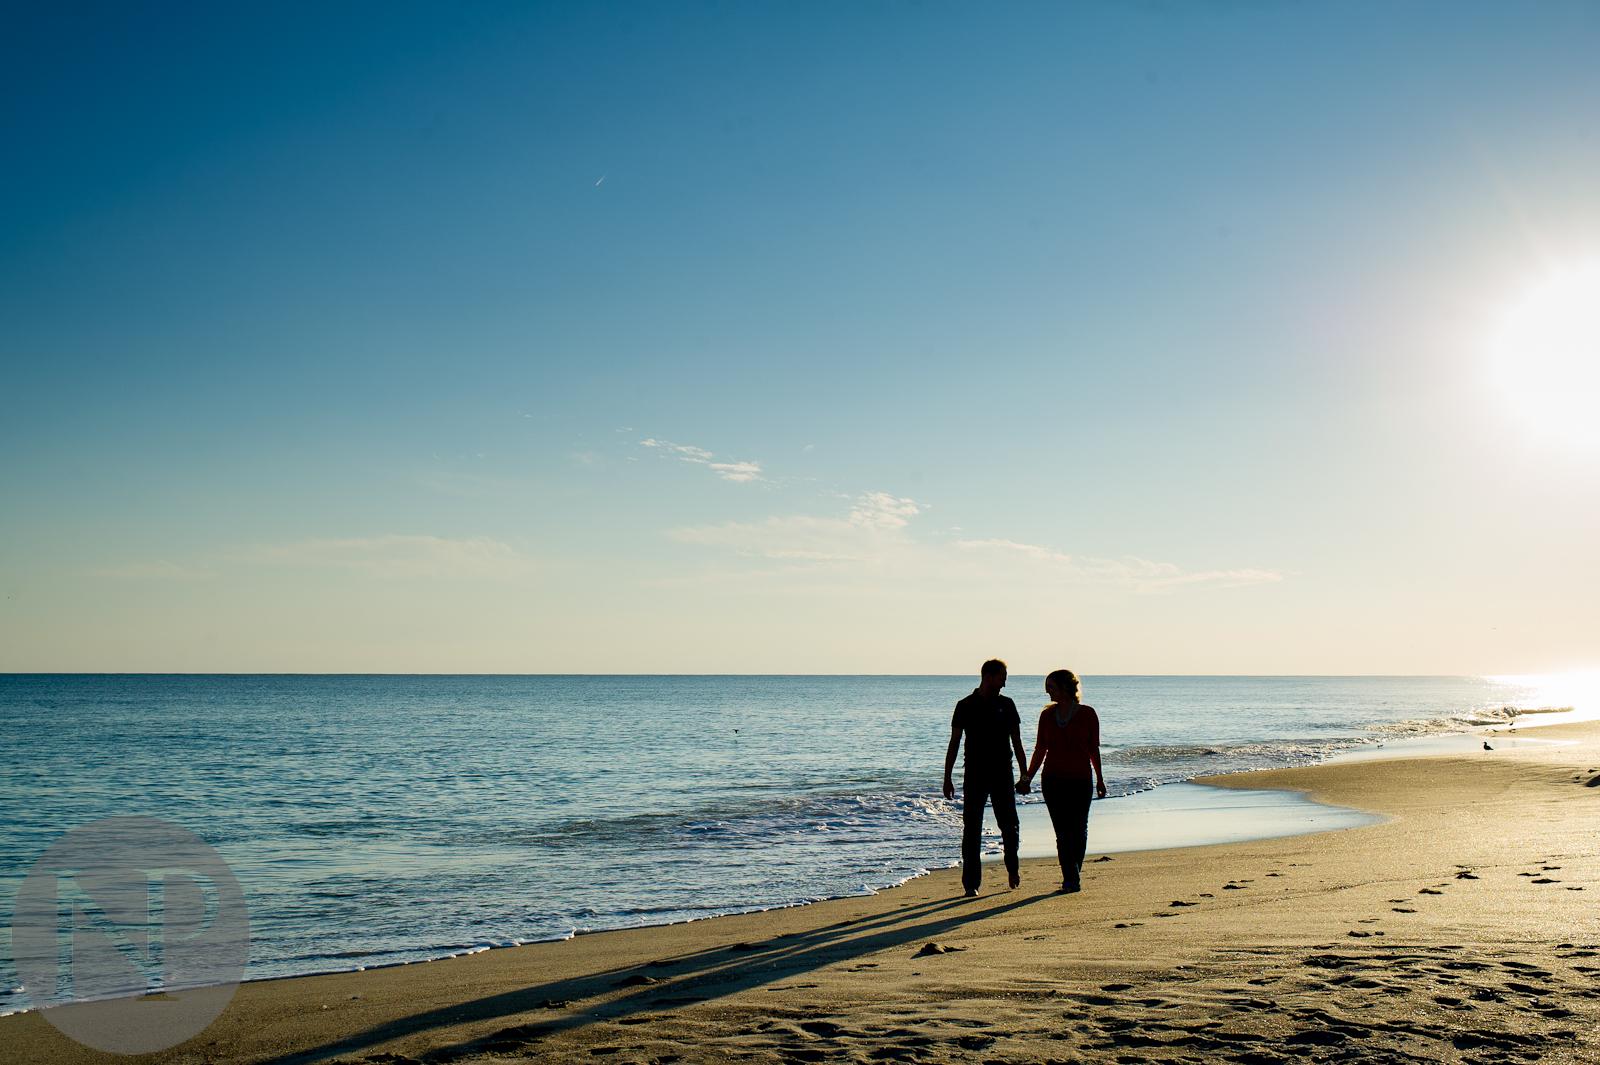 wedding photography north carolina - dc photographer - altantic ocean - beach photography engagement photo denis kaleigh-2.jpg